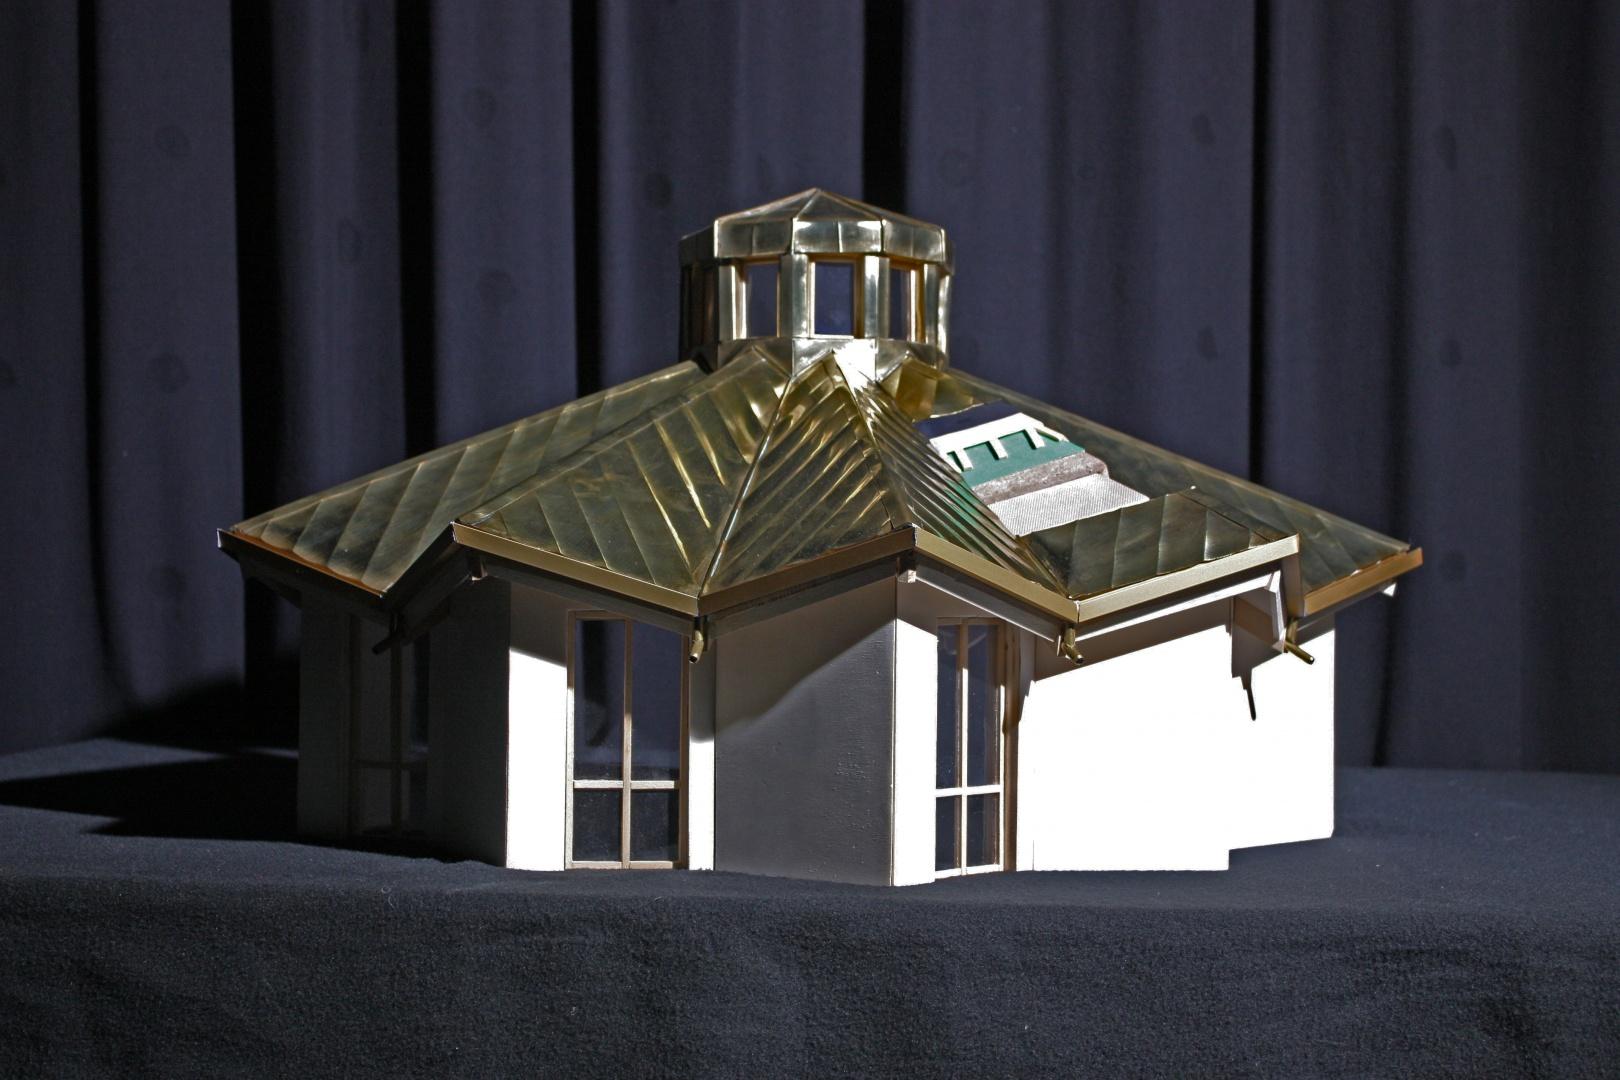 Modello 1:20 Approfondimento copertura, vista esterno © Patrik Nughedu